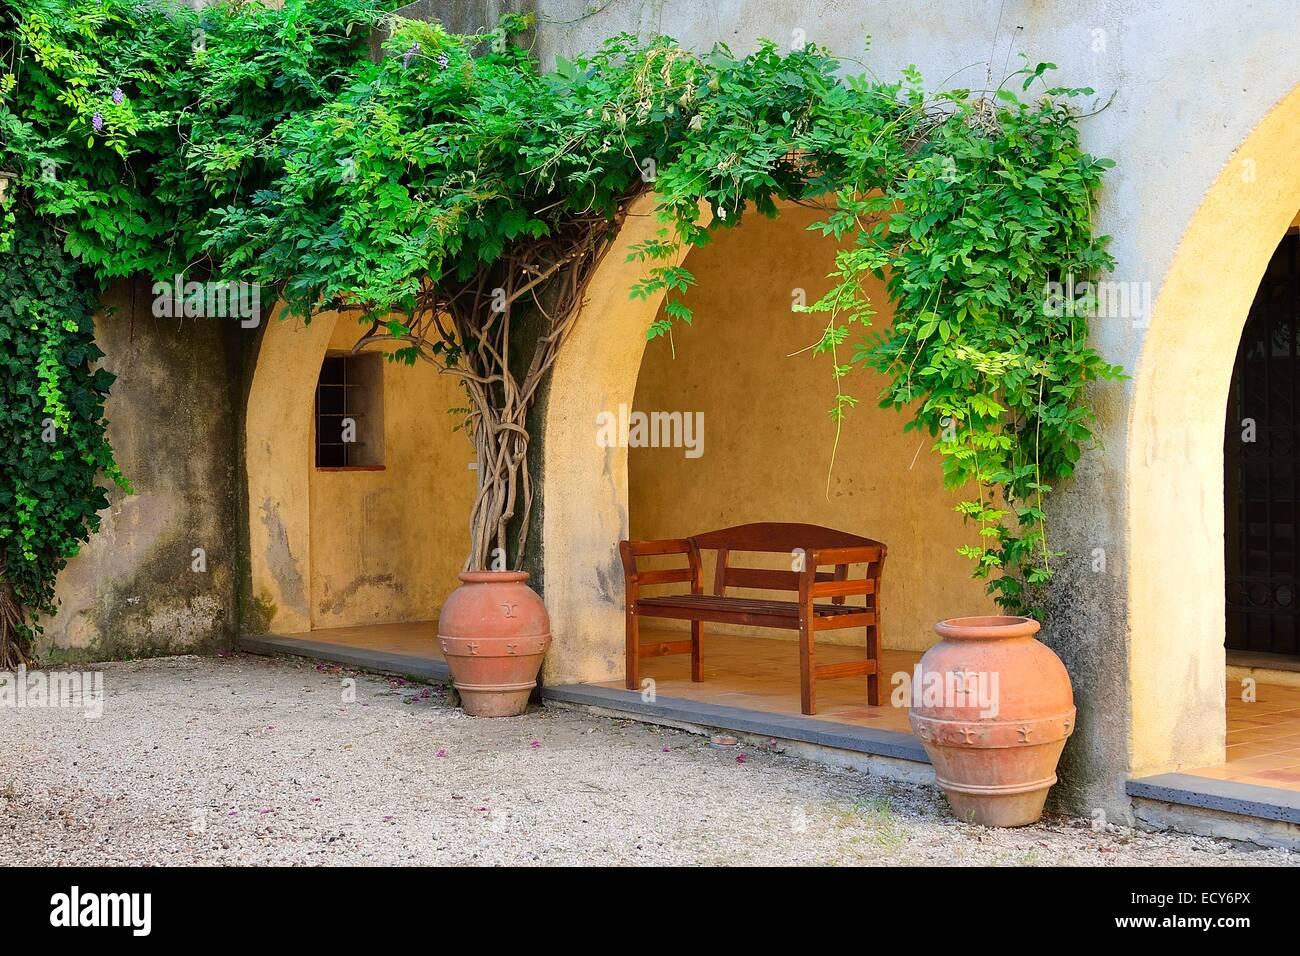 Wooden bench under an arcade, Orosei, Province of Nuoro, Sardinia, Italy Stock Photo